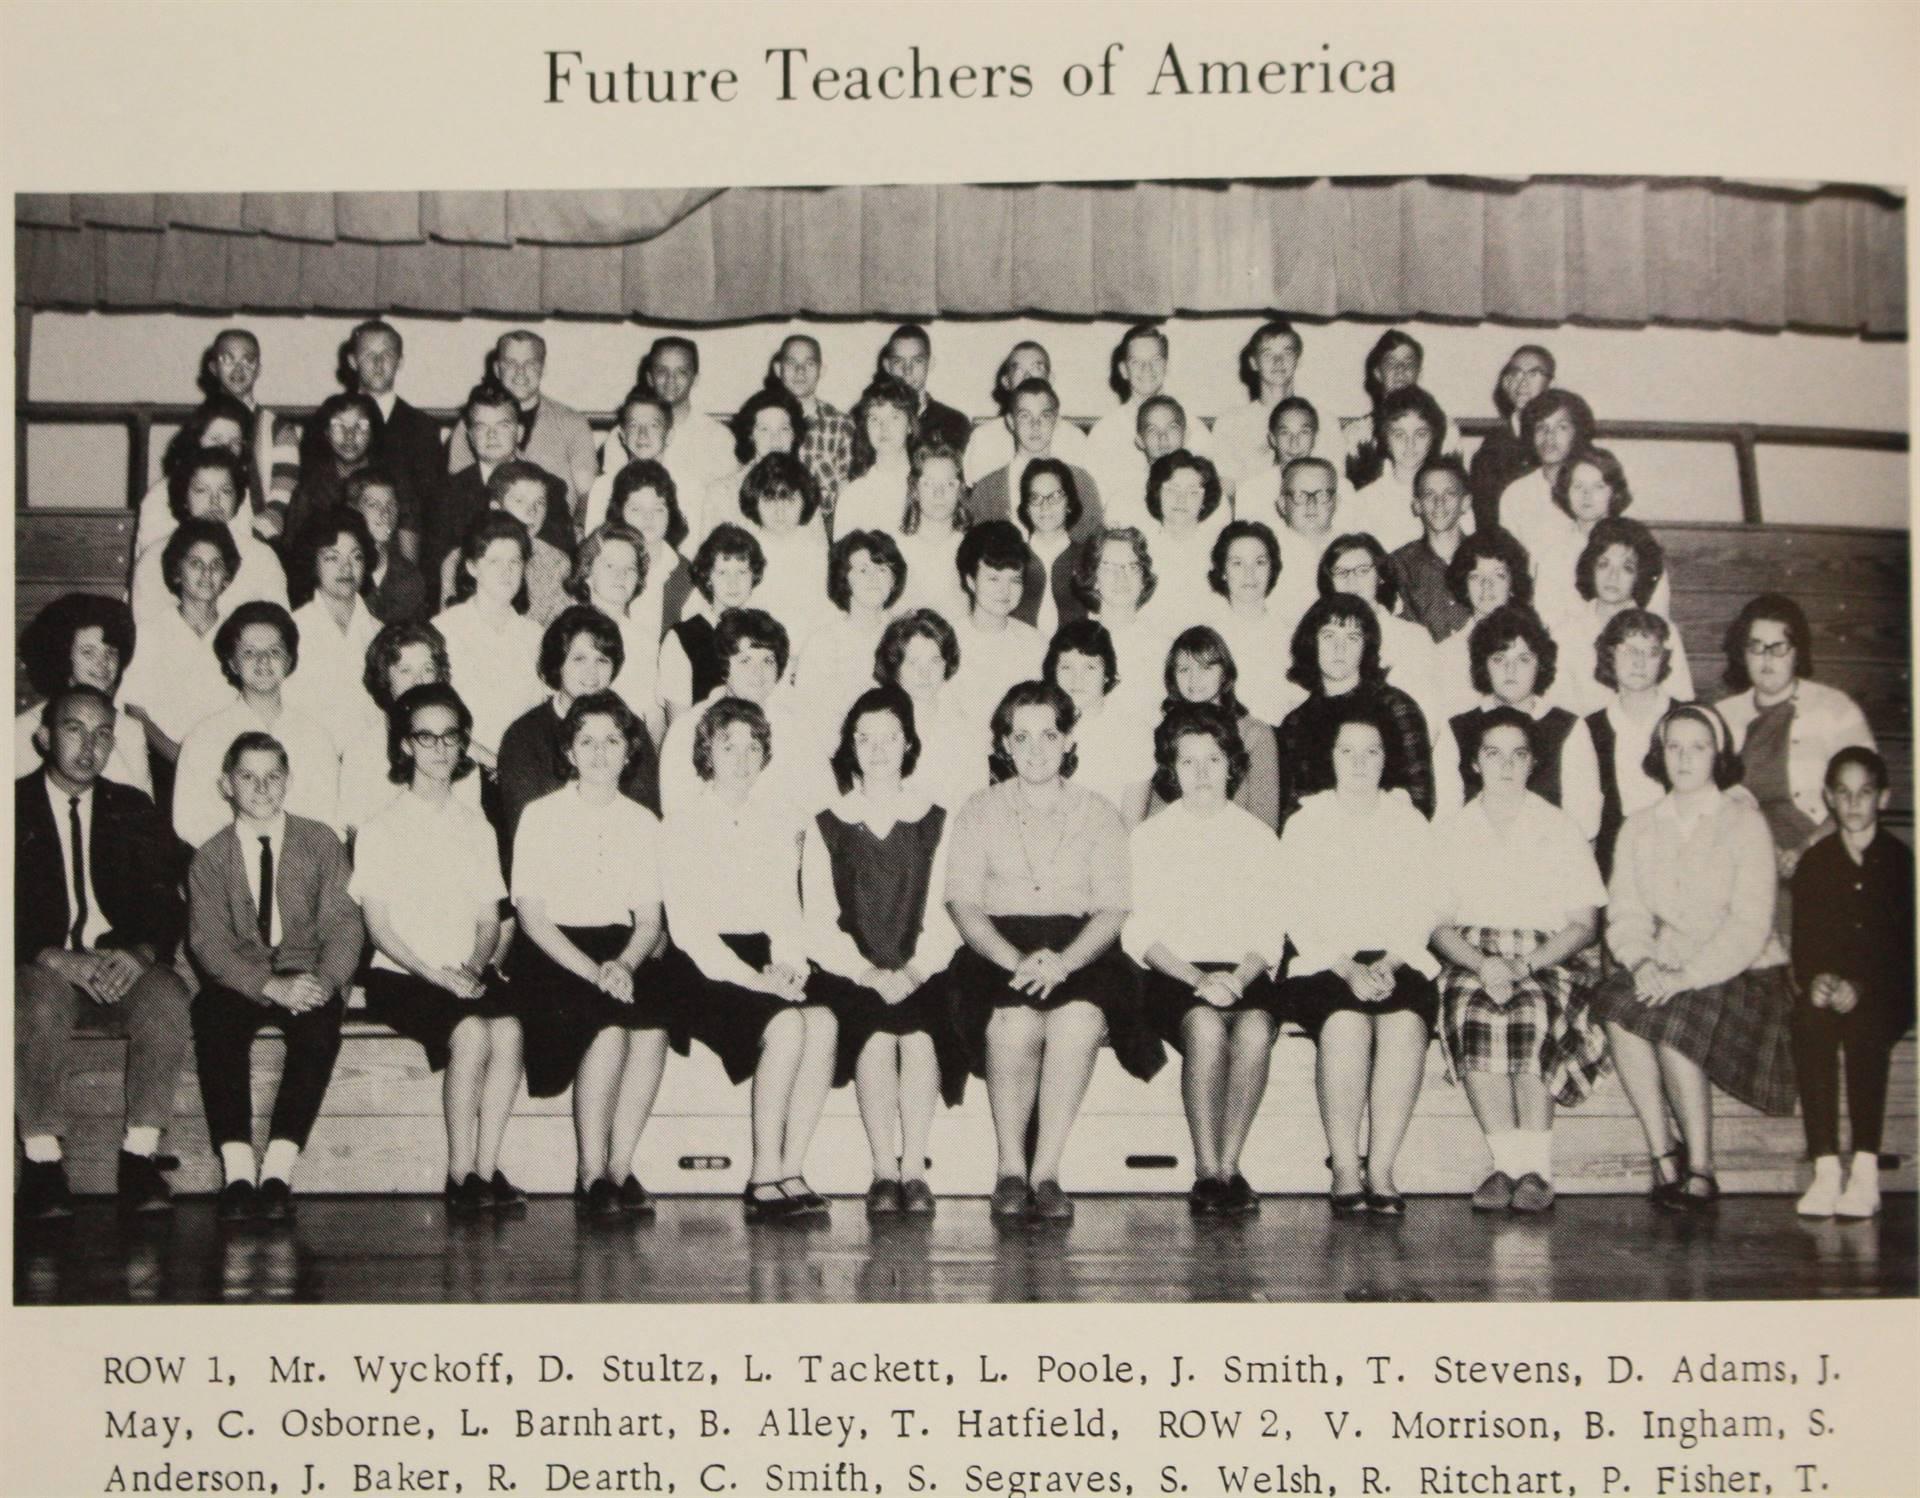 1965 future teachers of america